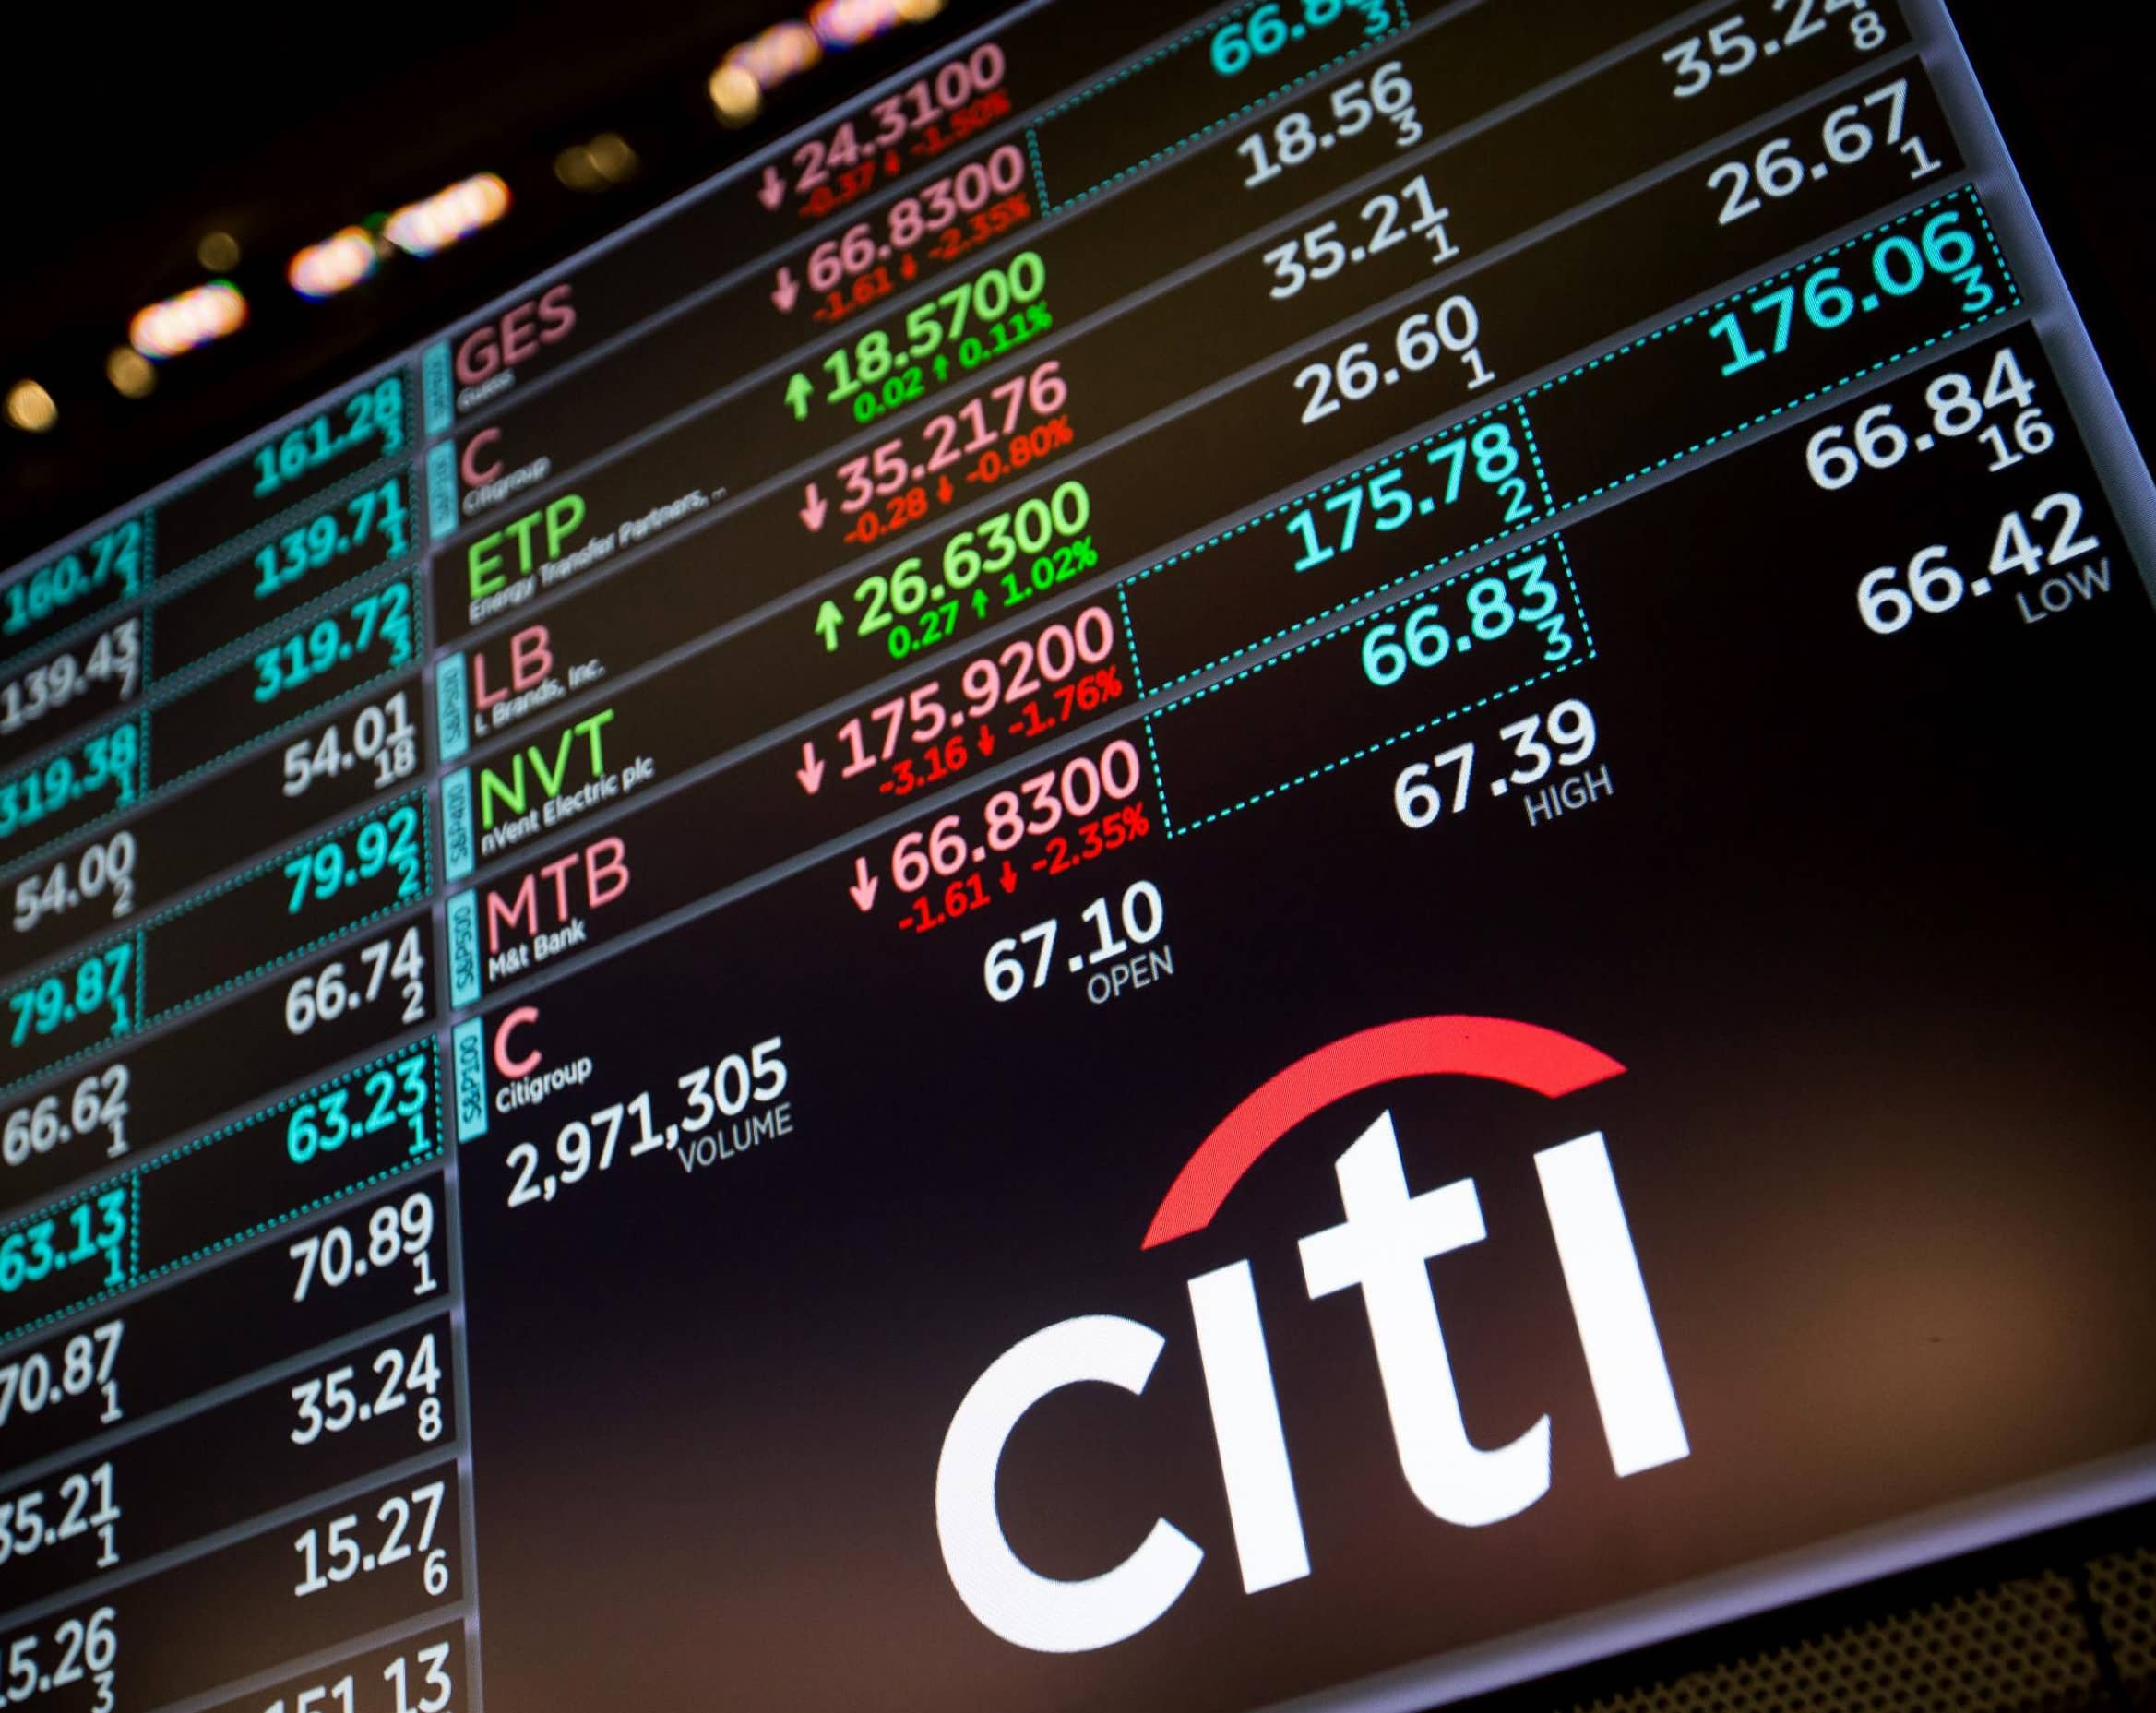 CITIGROUP PROFITS RISE 15%, HELPED BY TRADING LIKE JPMORGAN